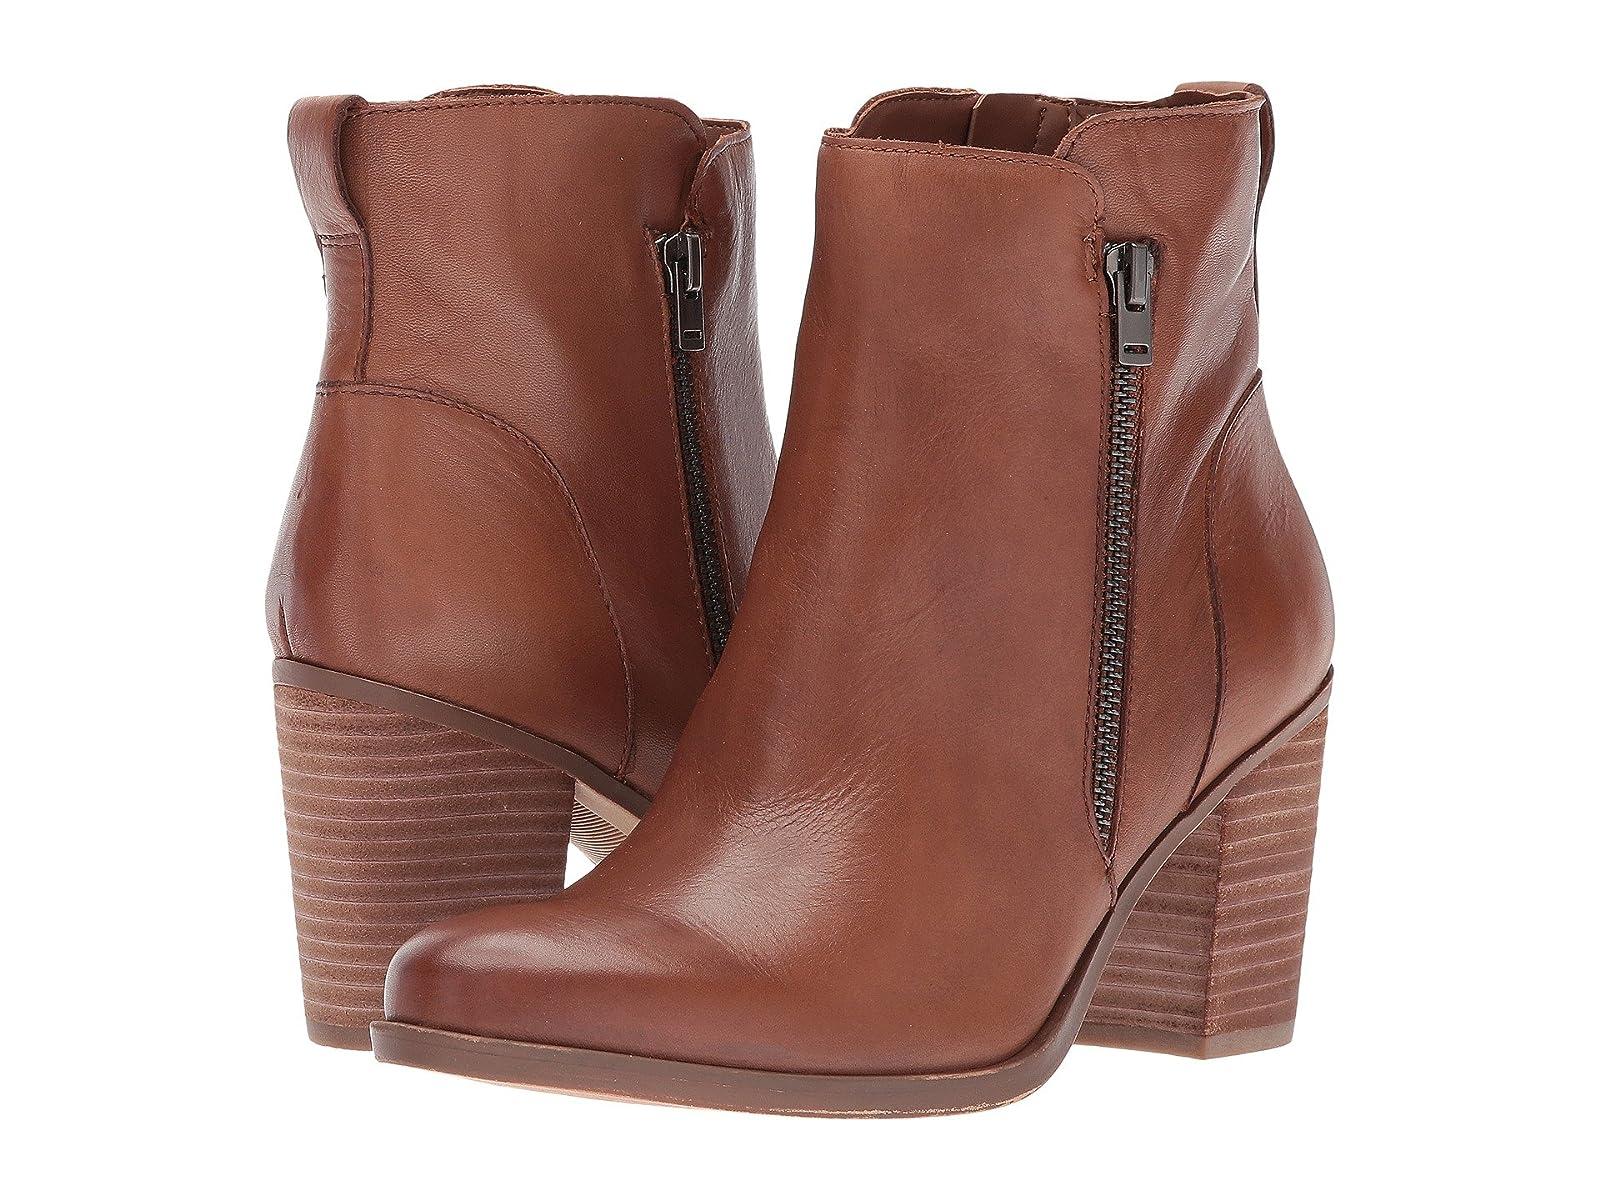 Naturalizer KalaCheap and distinctive eye-catching shoes